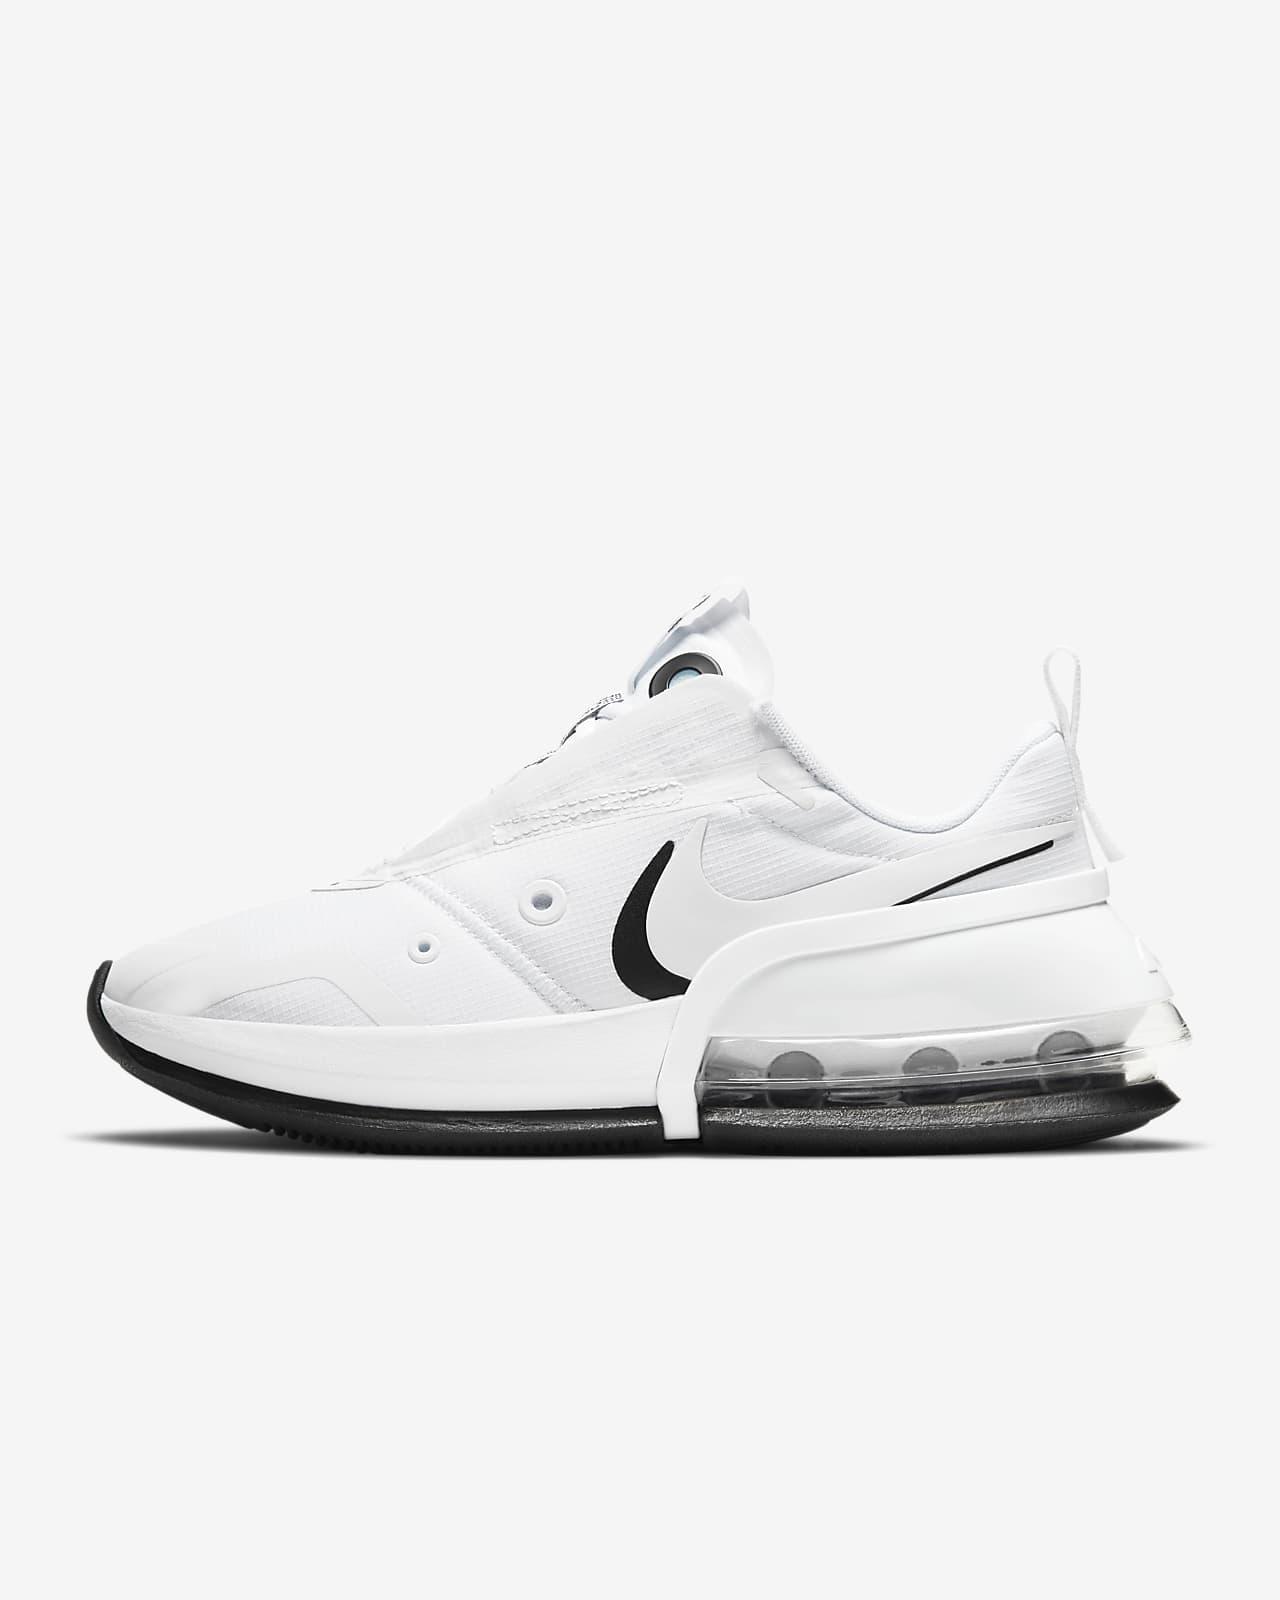 Nike Air Max Up Damenschuh